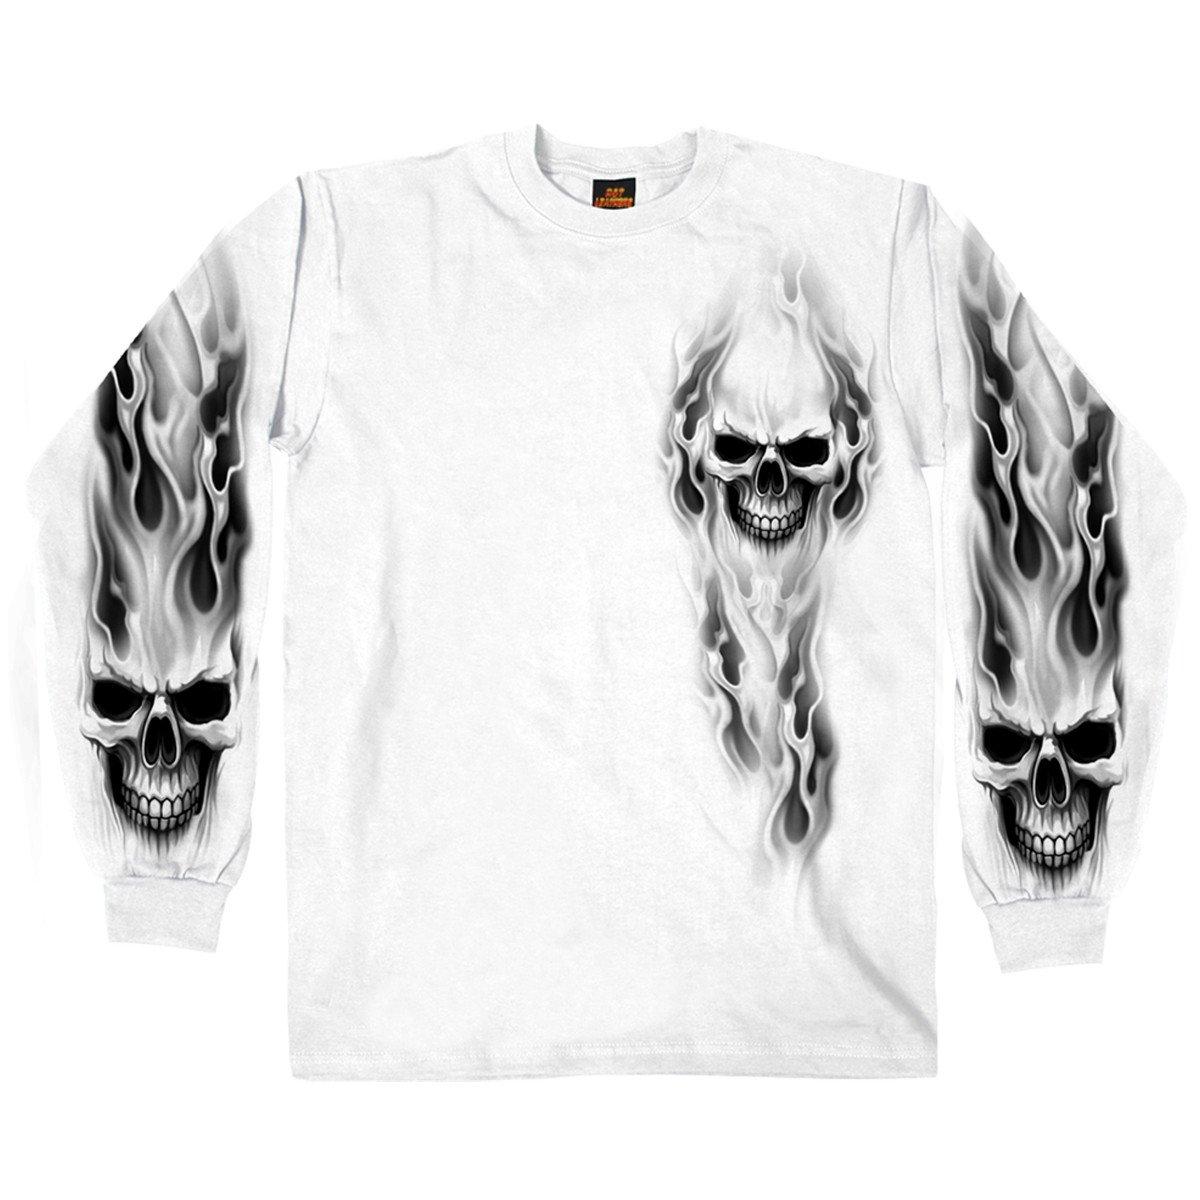 Hot Leathers Men's Ghost Skull Long Sleeve Shirt (White, XX-Large)